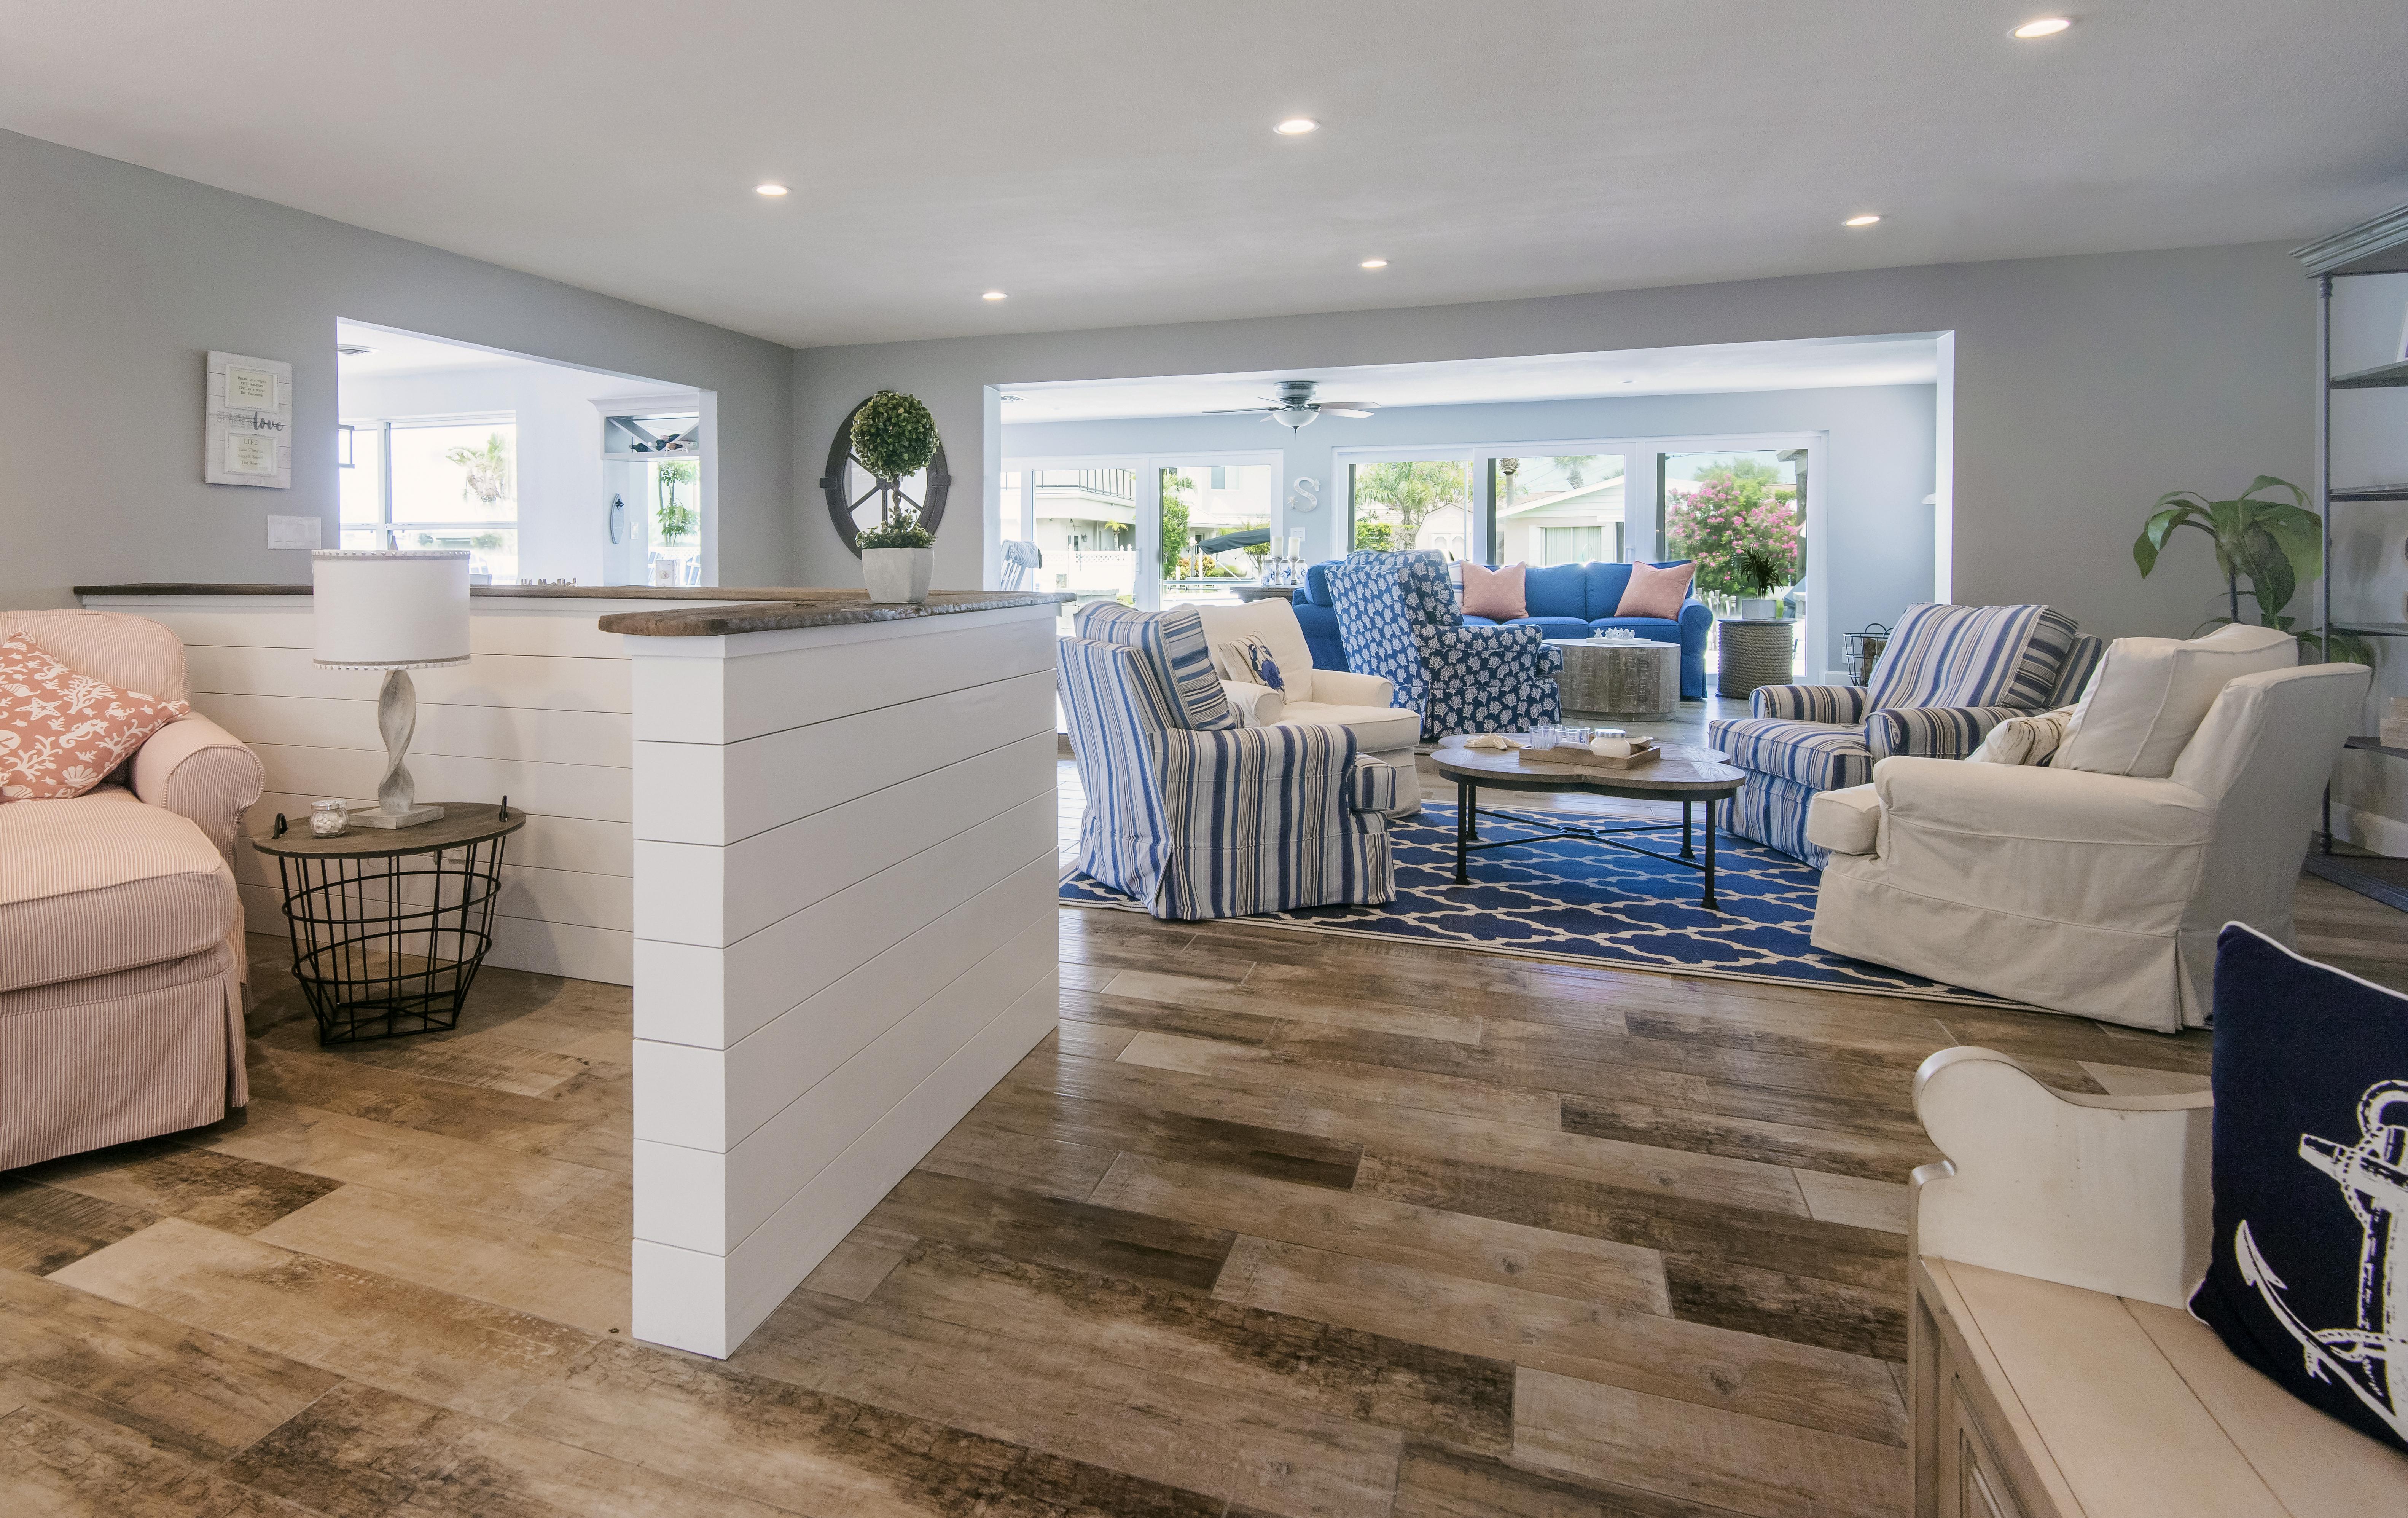 home renovation Heathrow Lake Mary Florida